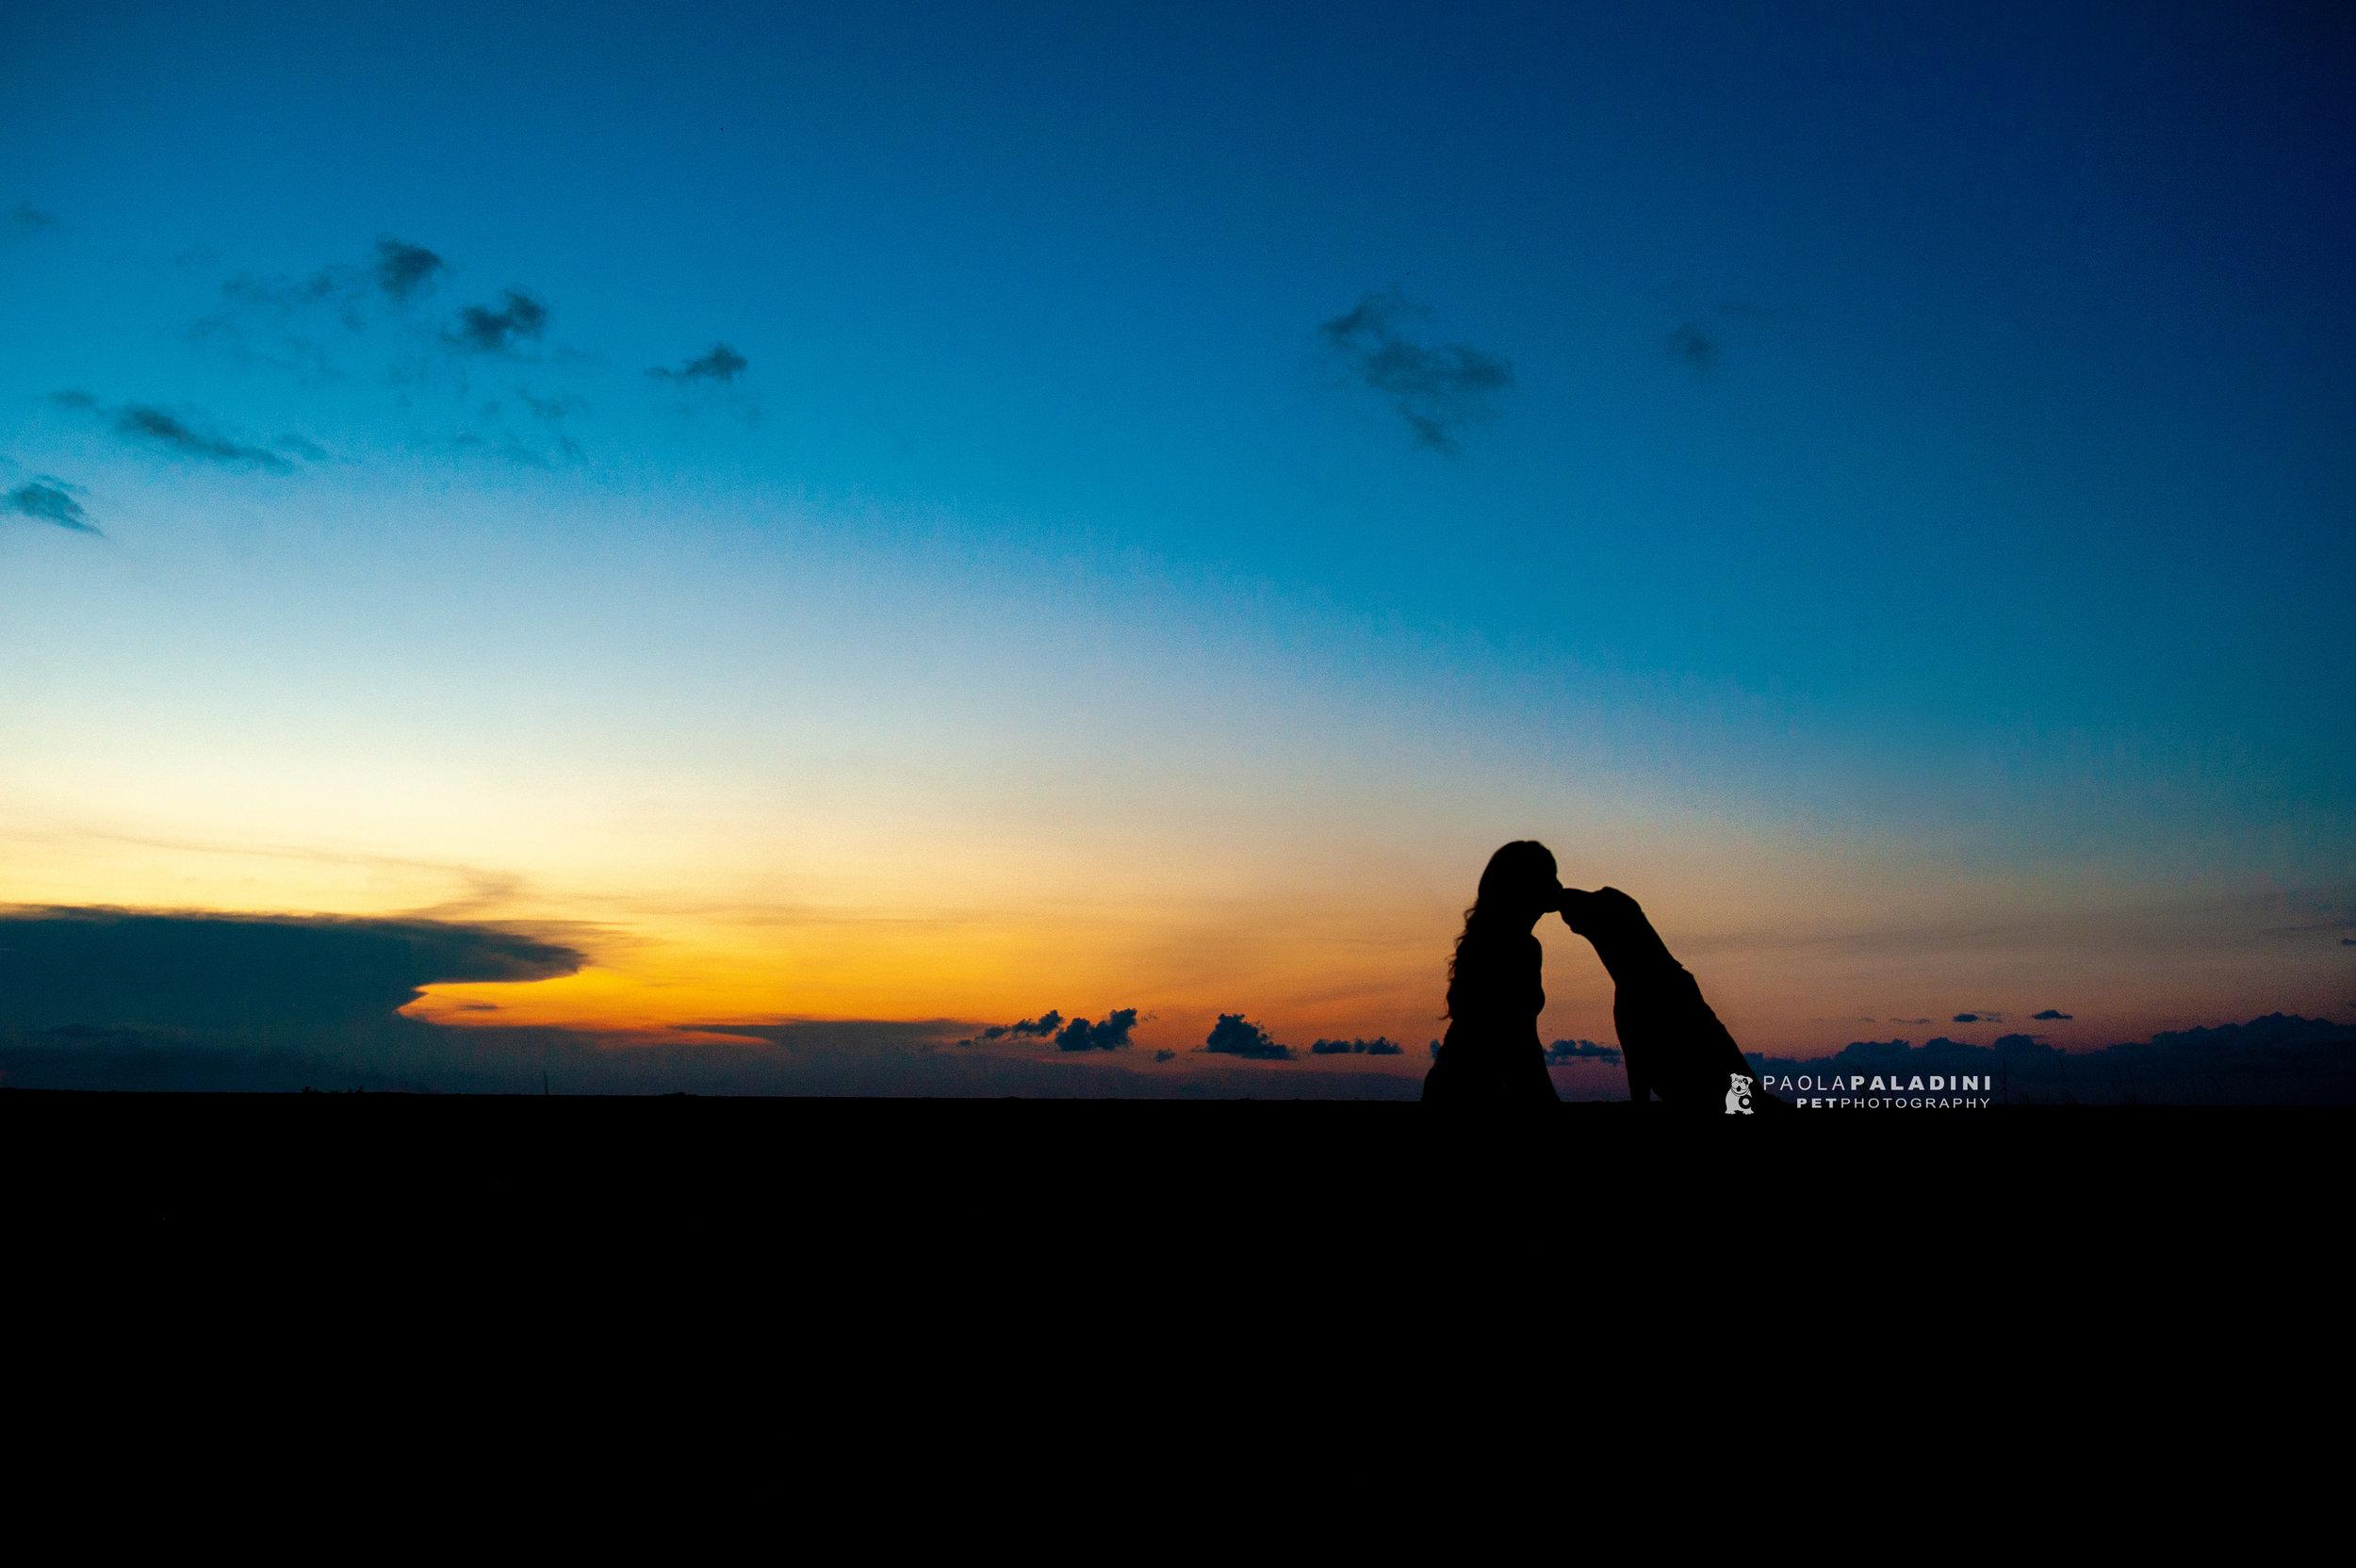 Paola-Paladini-Sunset-Silhouettes-Dog-Bloodhound-one